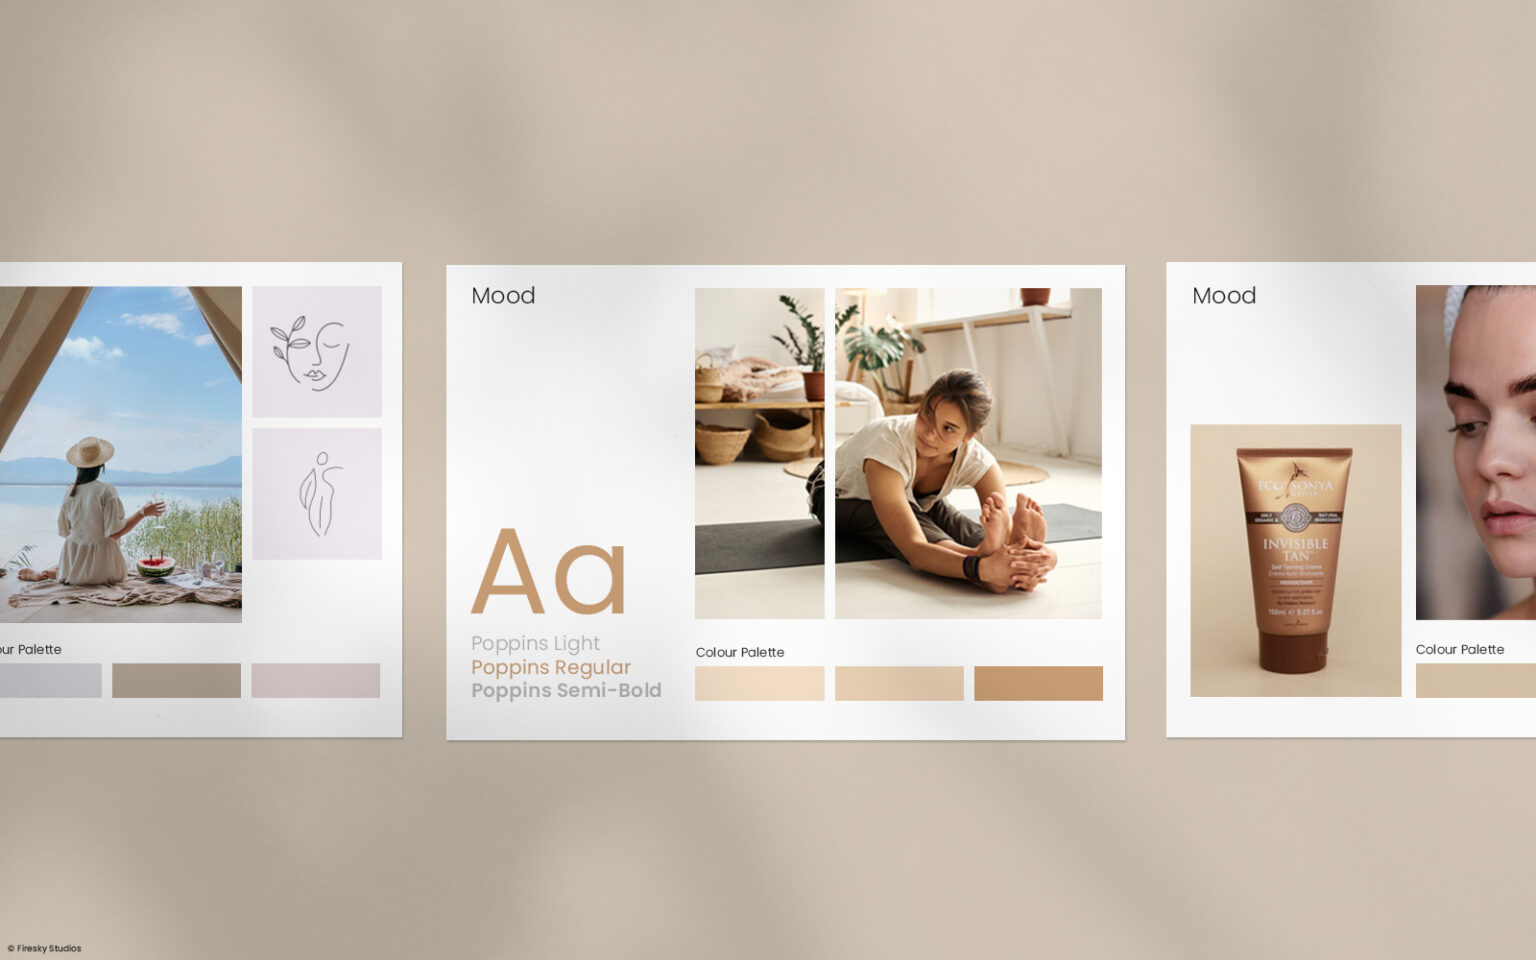 Brand Mood Boards